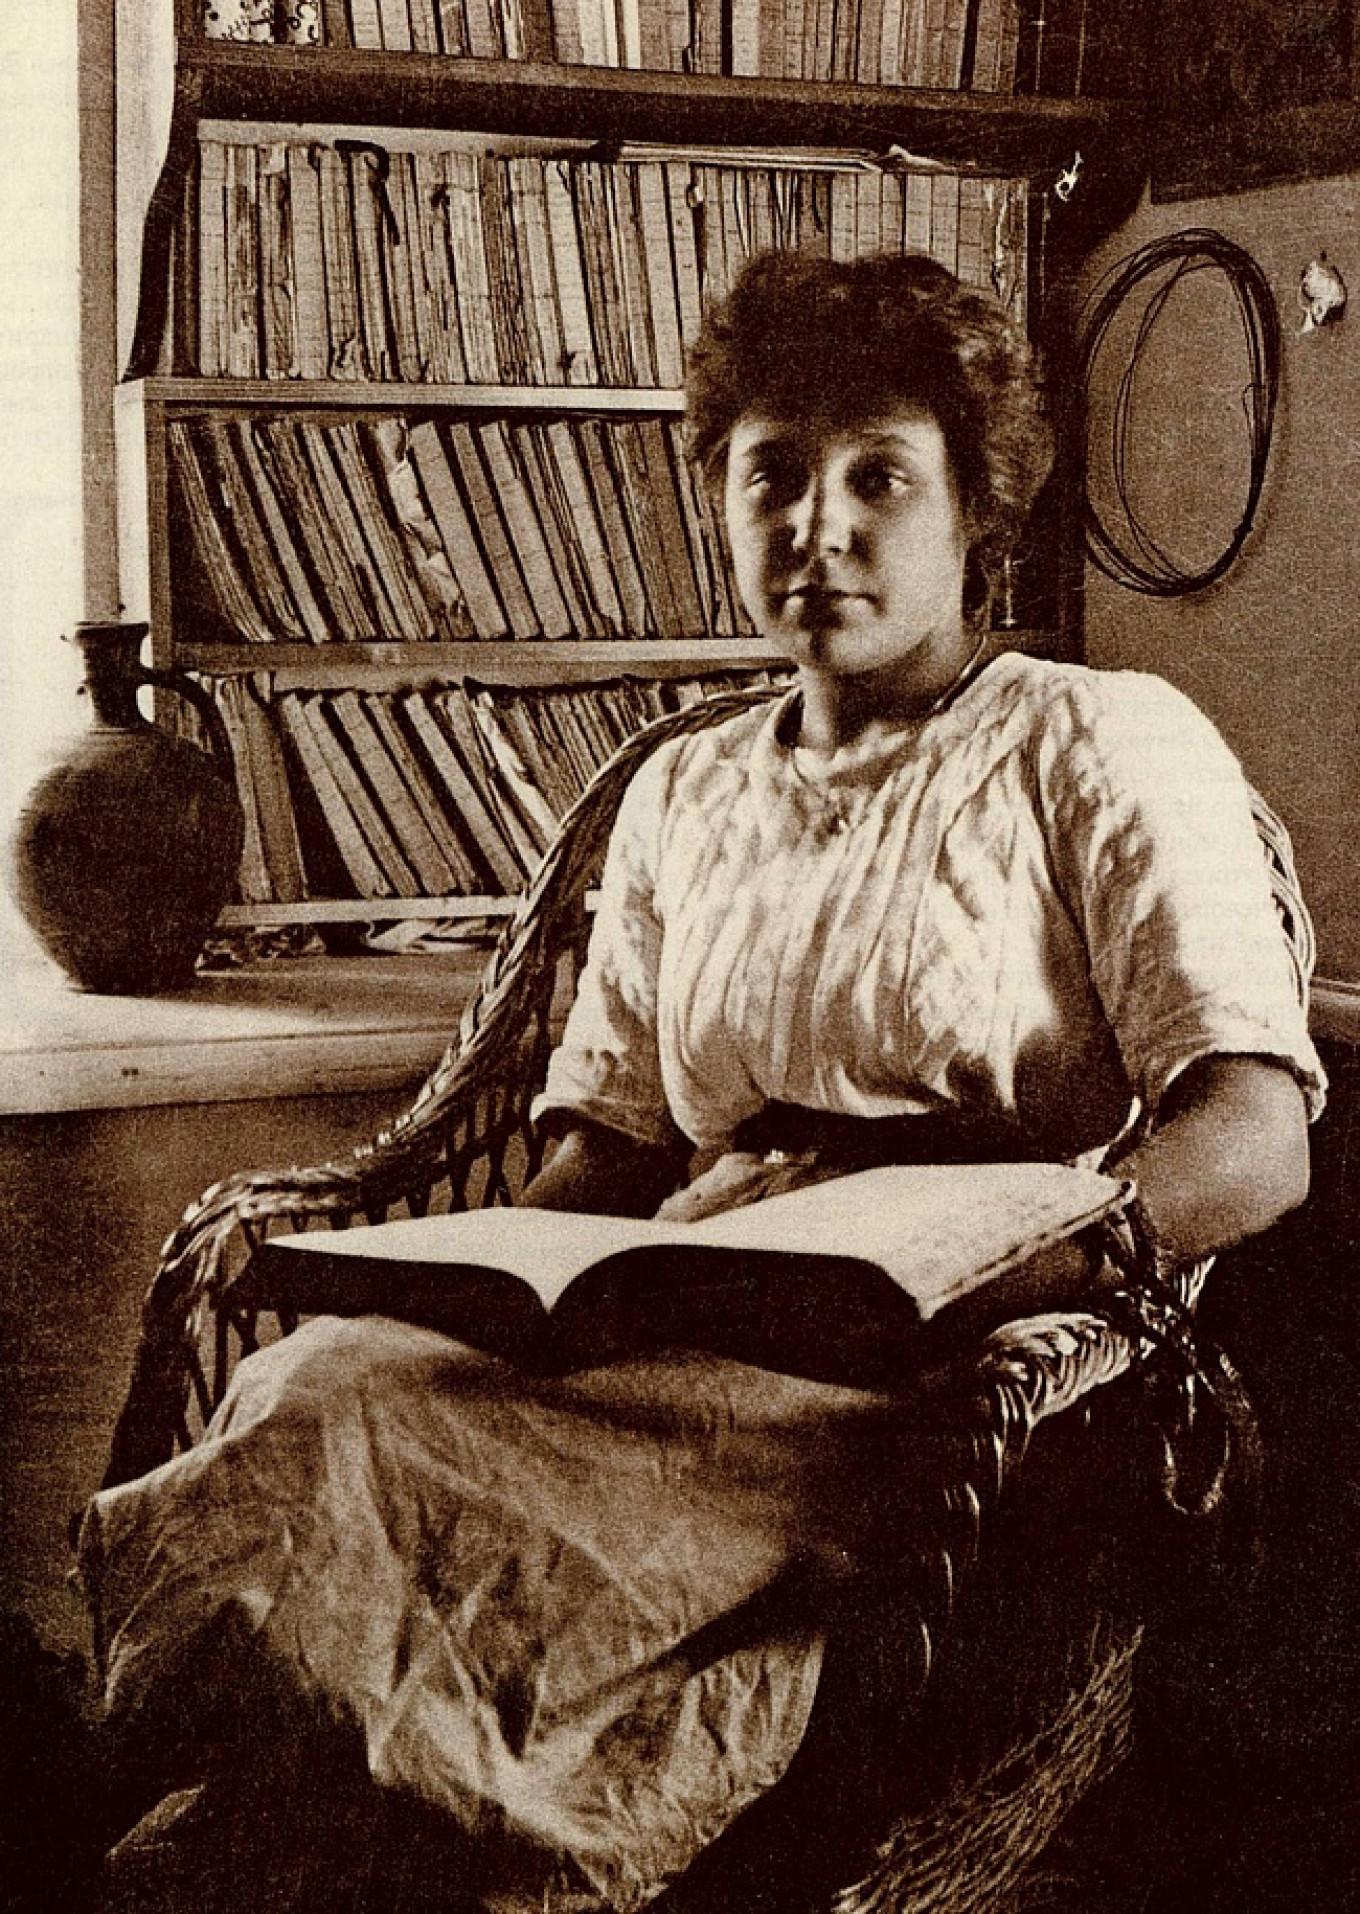 A photograph of Marina Tsvetaeva taken in the Crimean village of Koktebel in 1911. Maximilian Voloshin